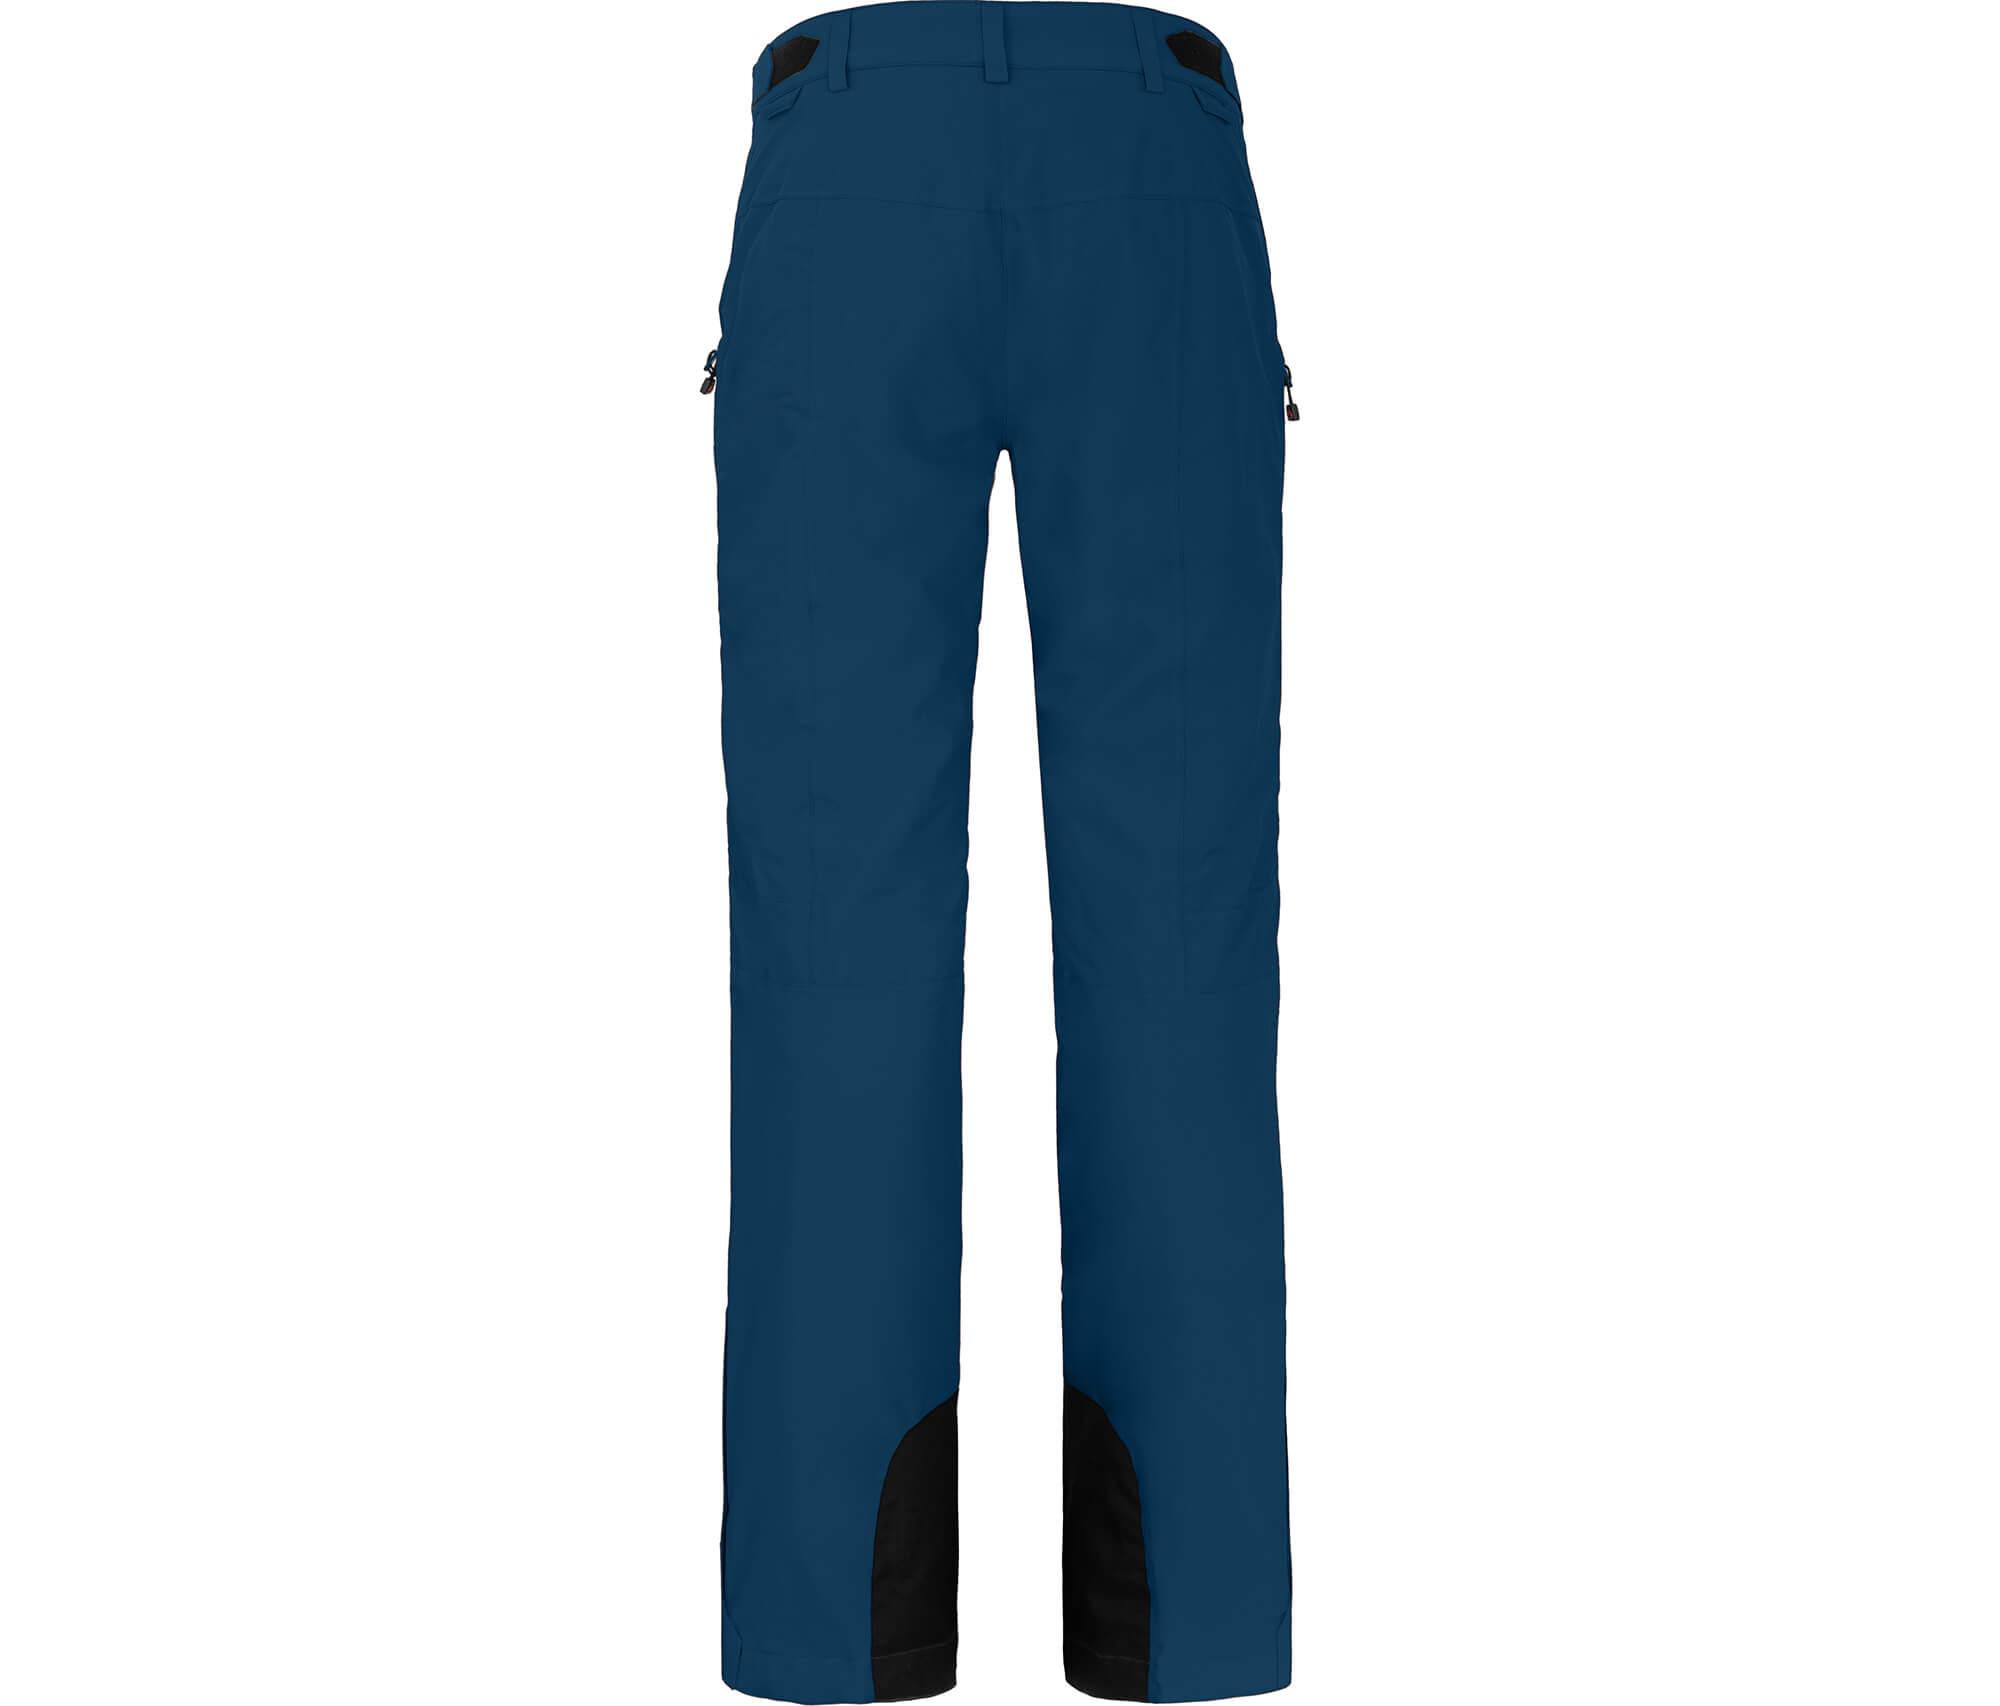 Dunkel Blau --> Skibekleidung